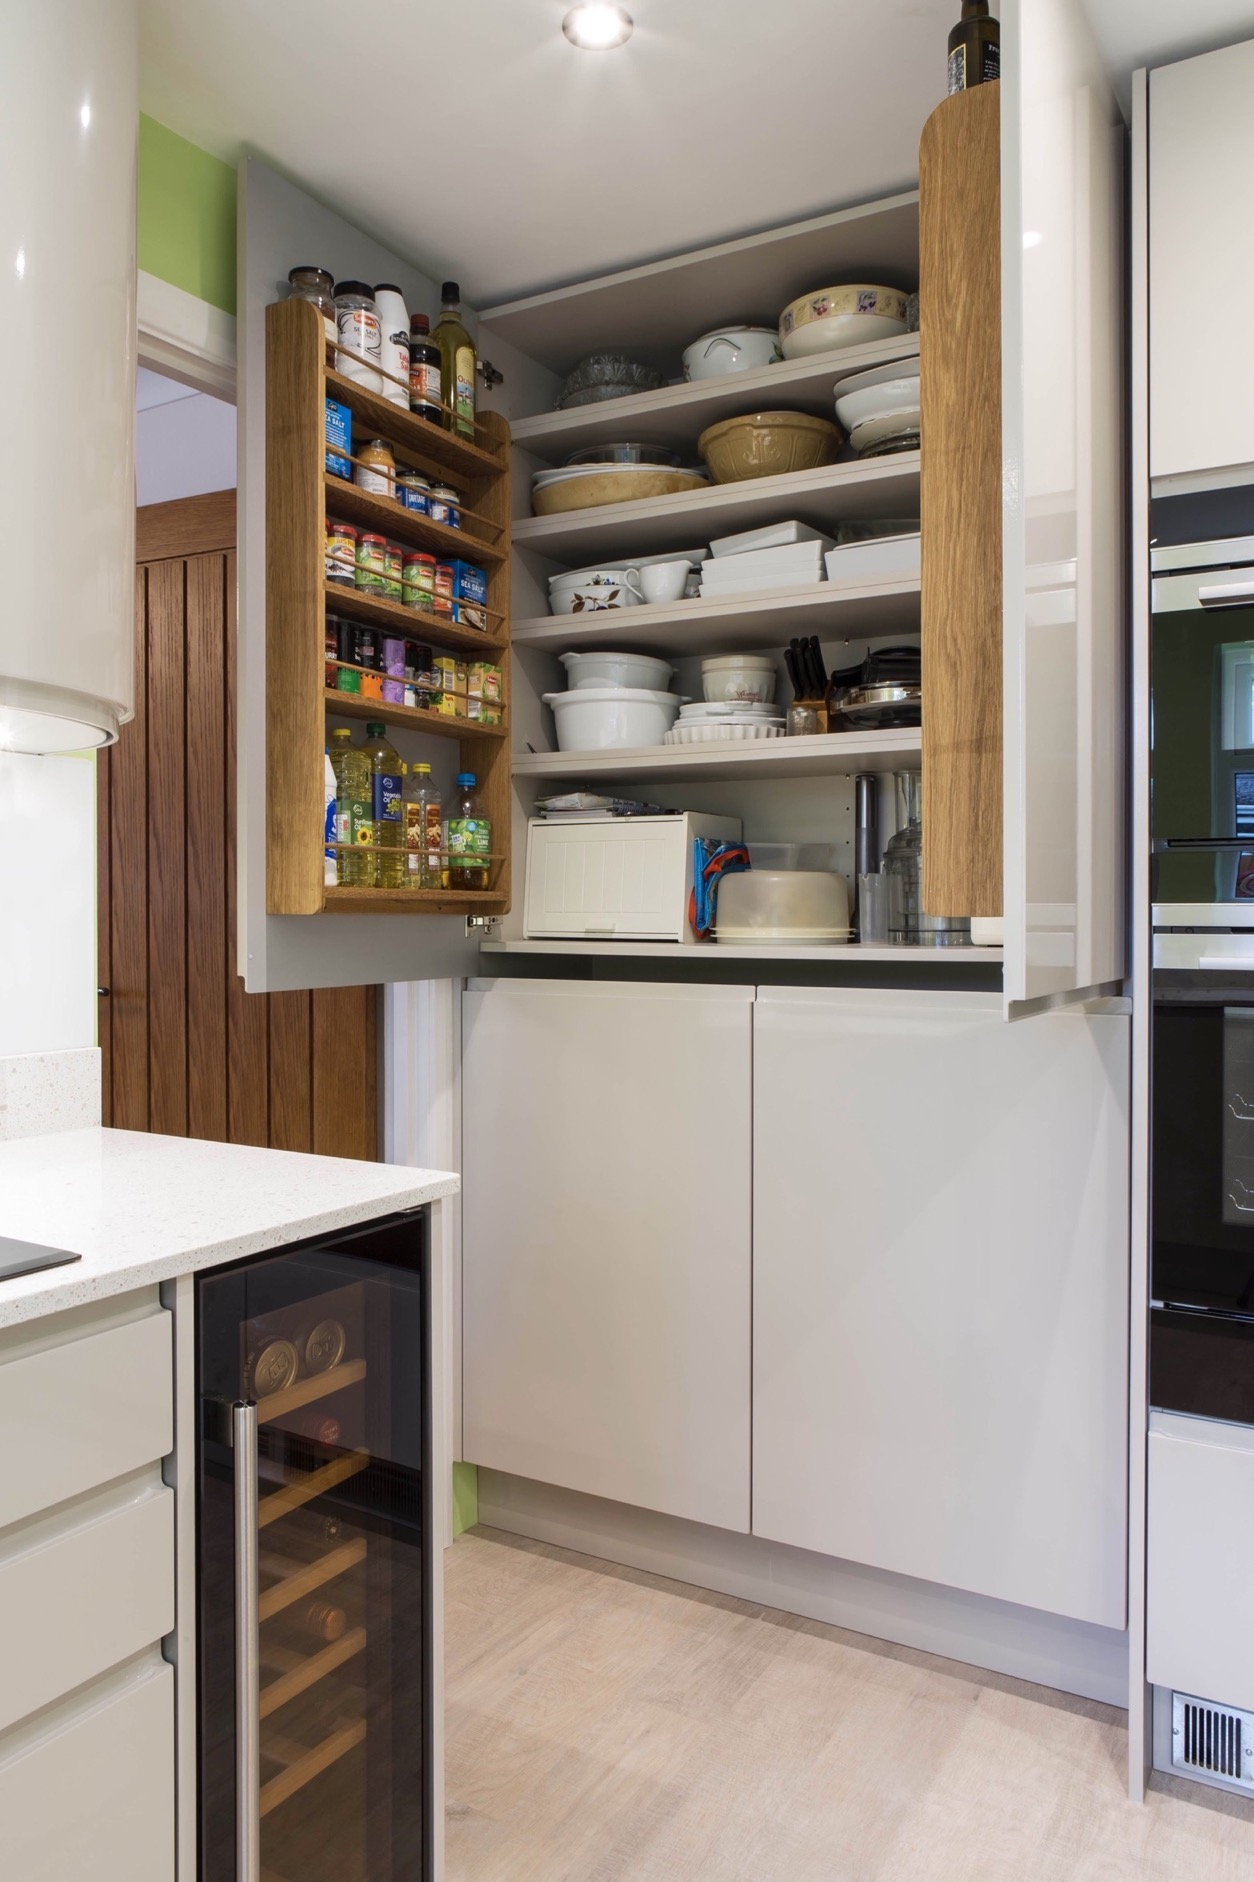 oak larder door storage racks princes risborough longwick bespoke kitchen